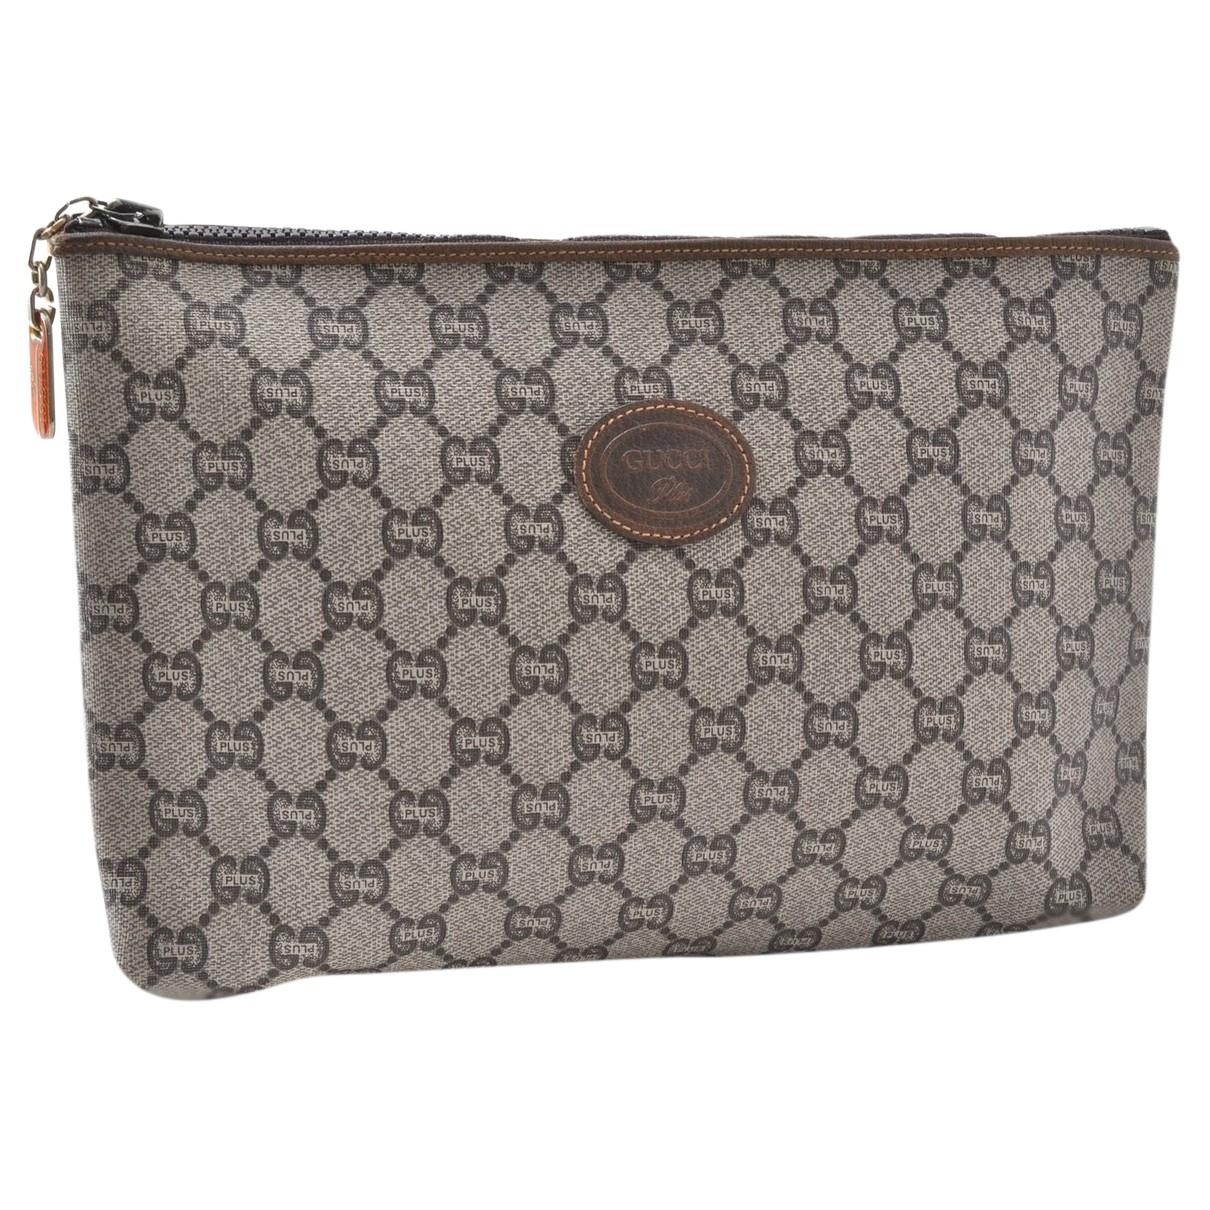 Gucci N Brown Clutch bag for Women N